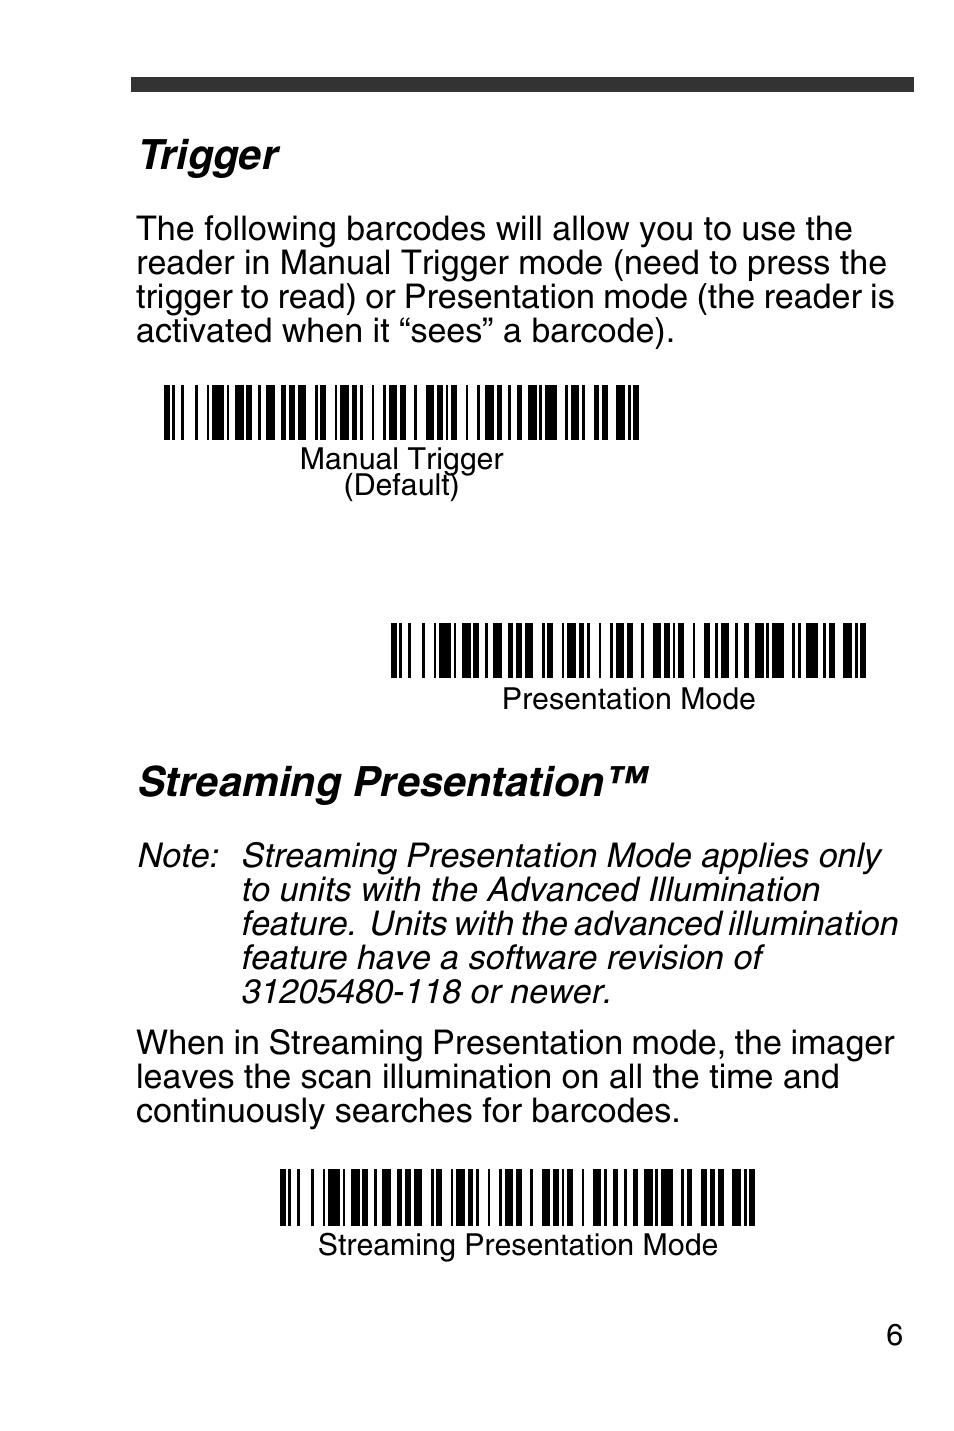 trigger streaming presentation honeywell 4600g user manual page rh manualsdir com Honeywell IT4600 Driver honeywell barcode scanner 4600g manual